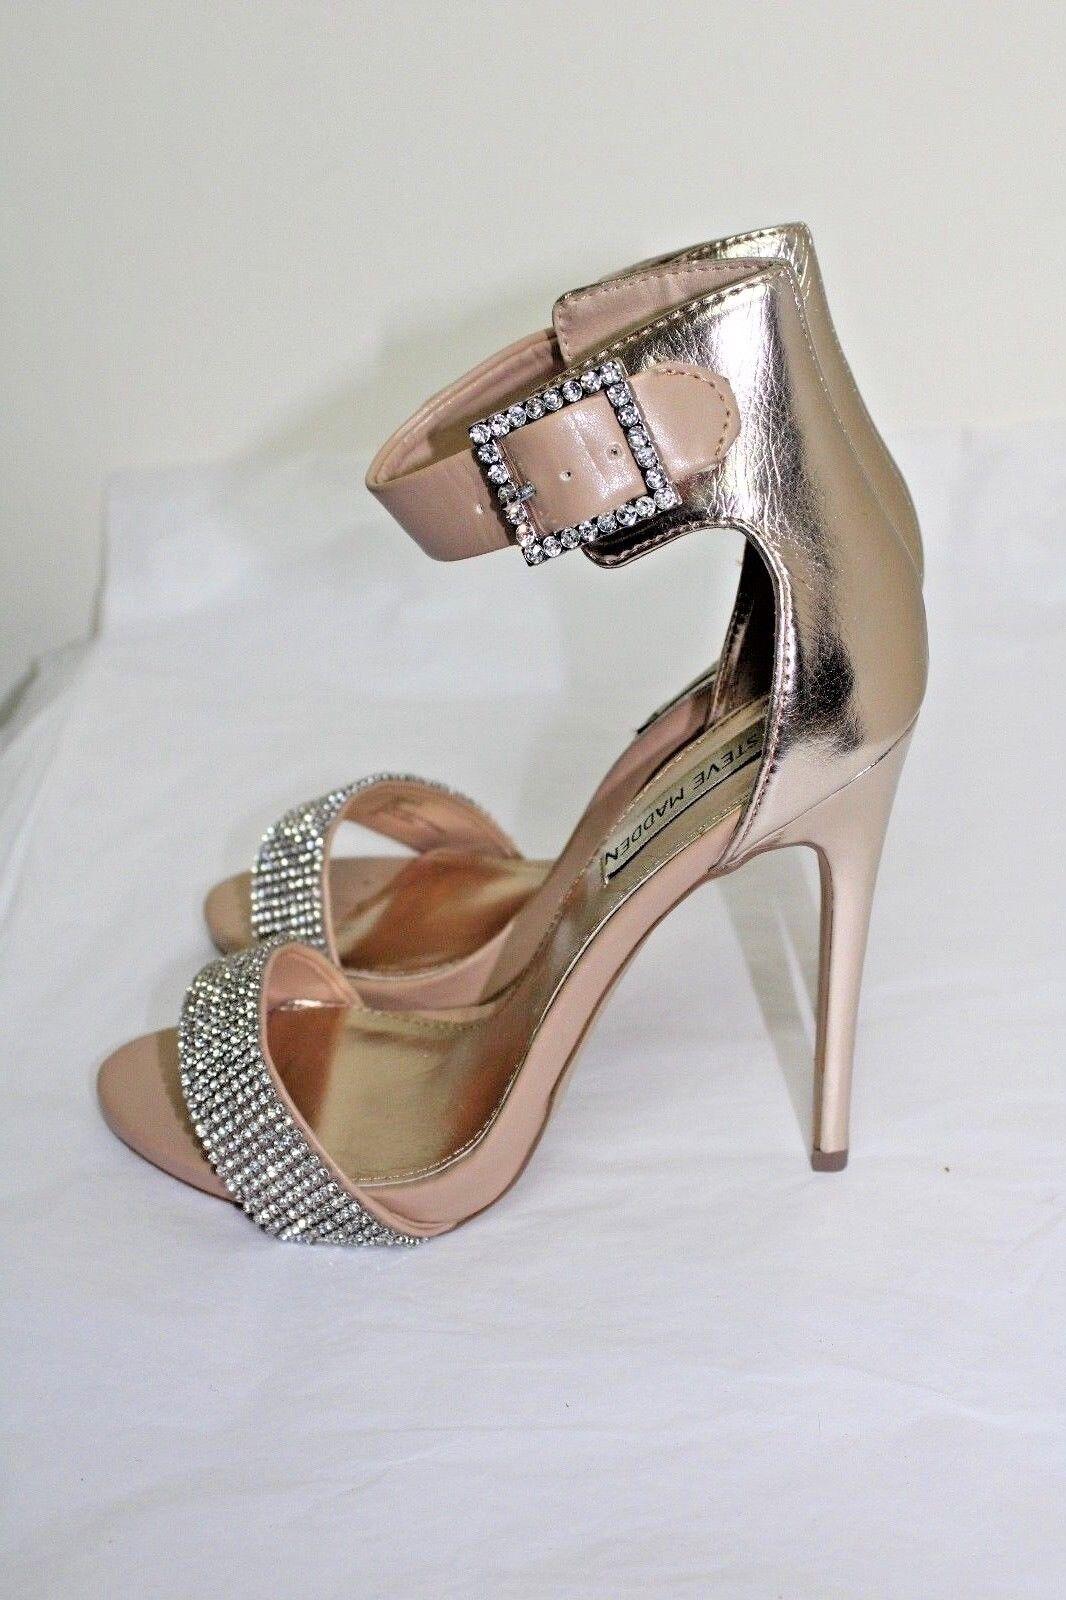 Steve Madden Marlen-R Rhinestone Ankle Strap Nude gold Sandals 8.5M